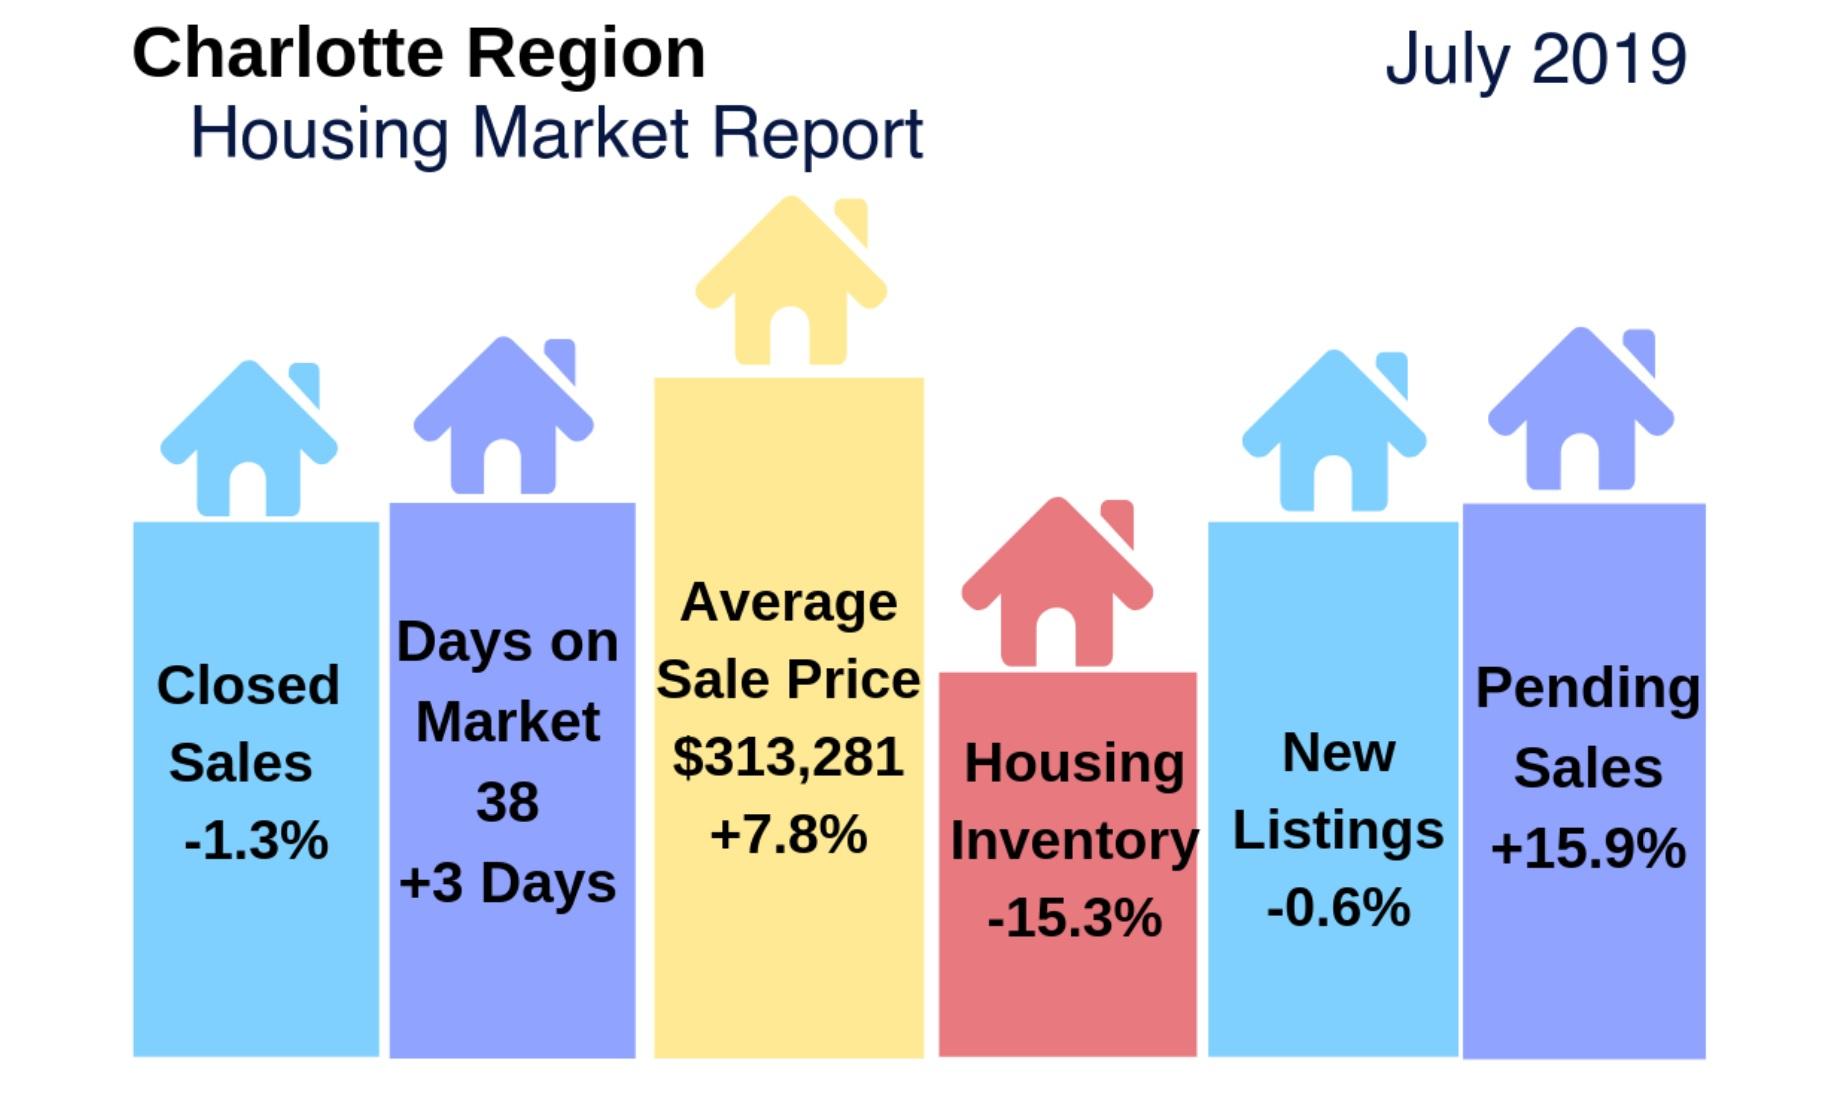 Charlotte Region Real Estate Report & Housing Market Snapshot: July 2019